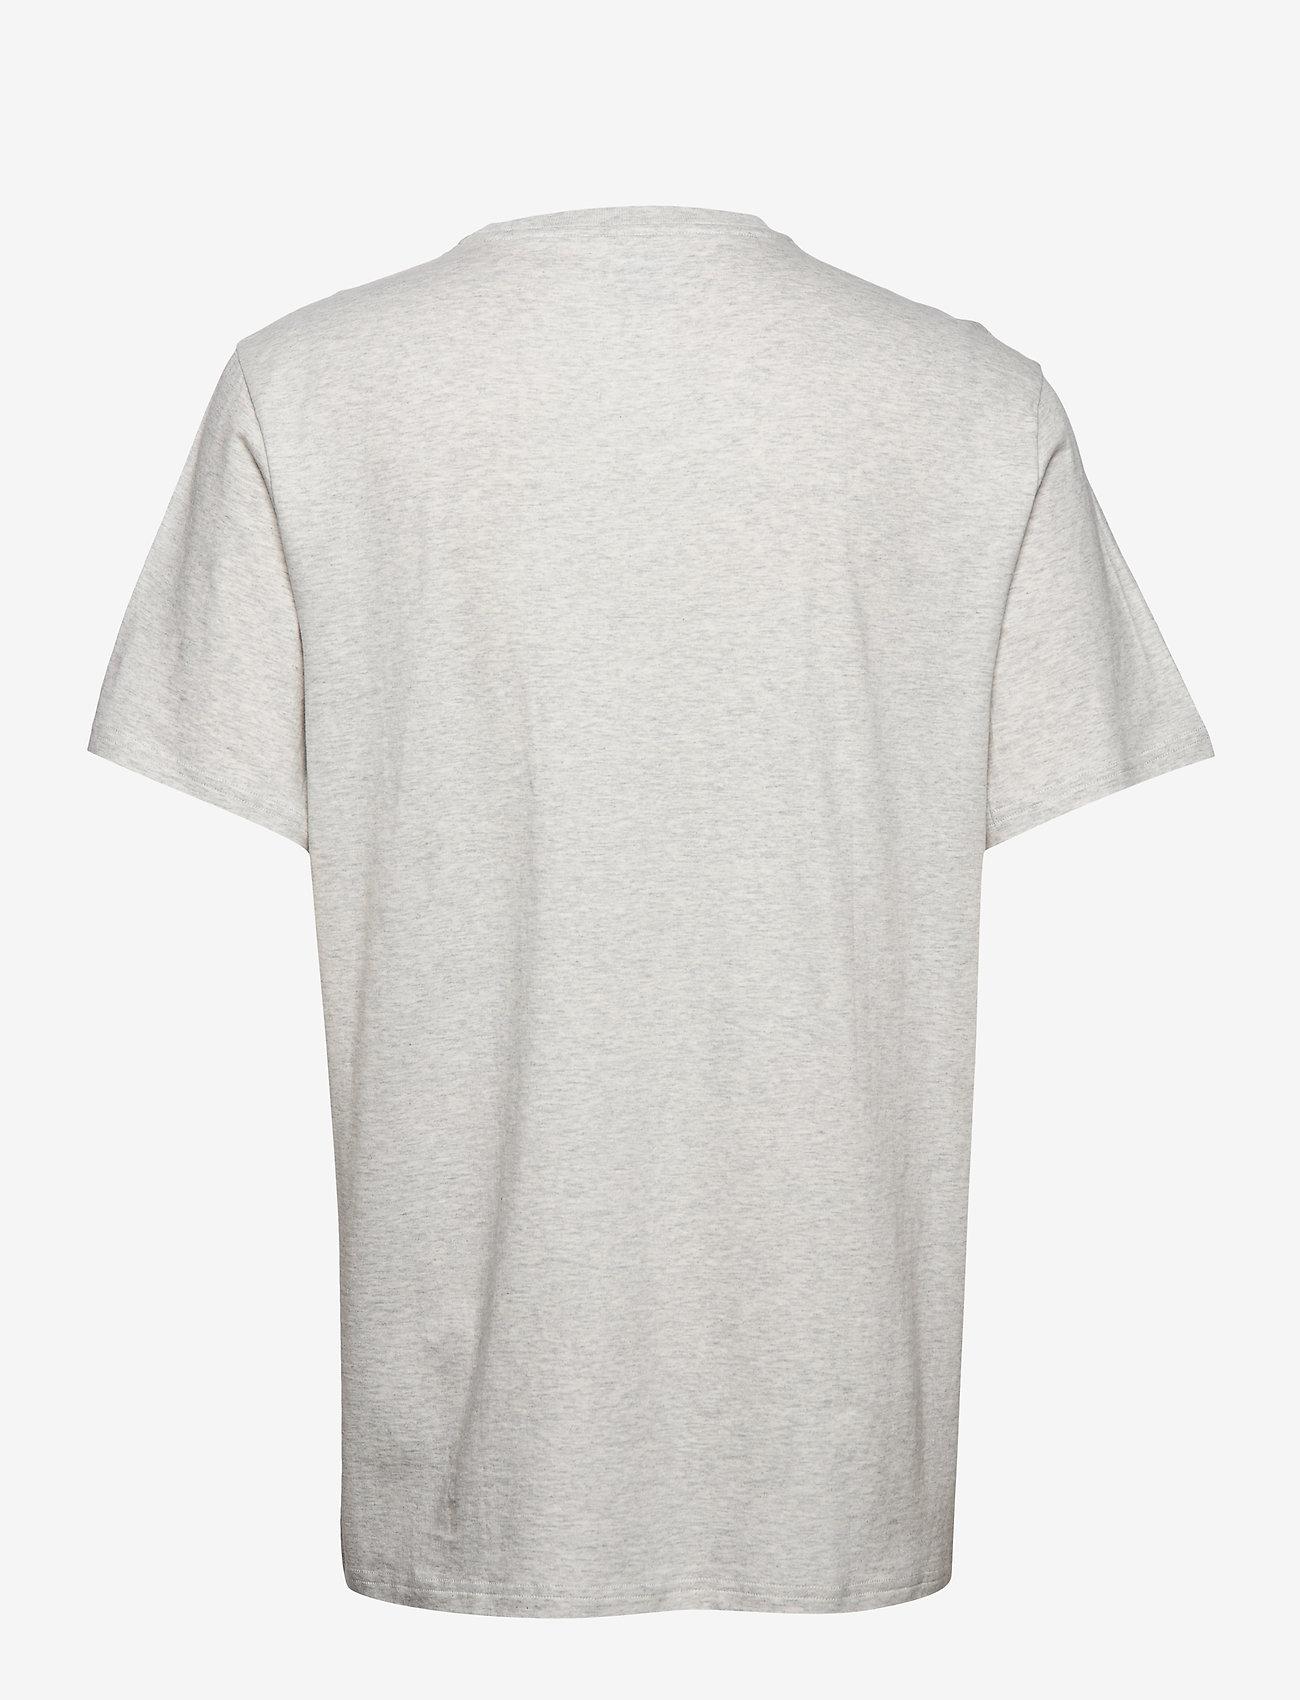 Polo Ralph Lauren Underwear - LIQUID COTTON-CRW-STP - kurzärmelig - english heather - 1